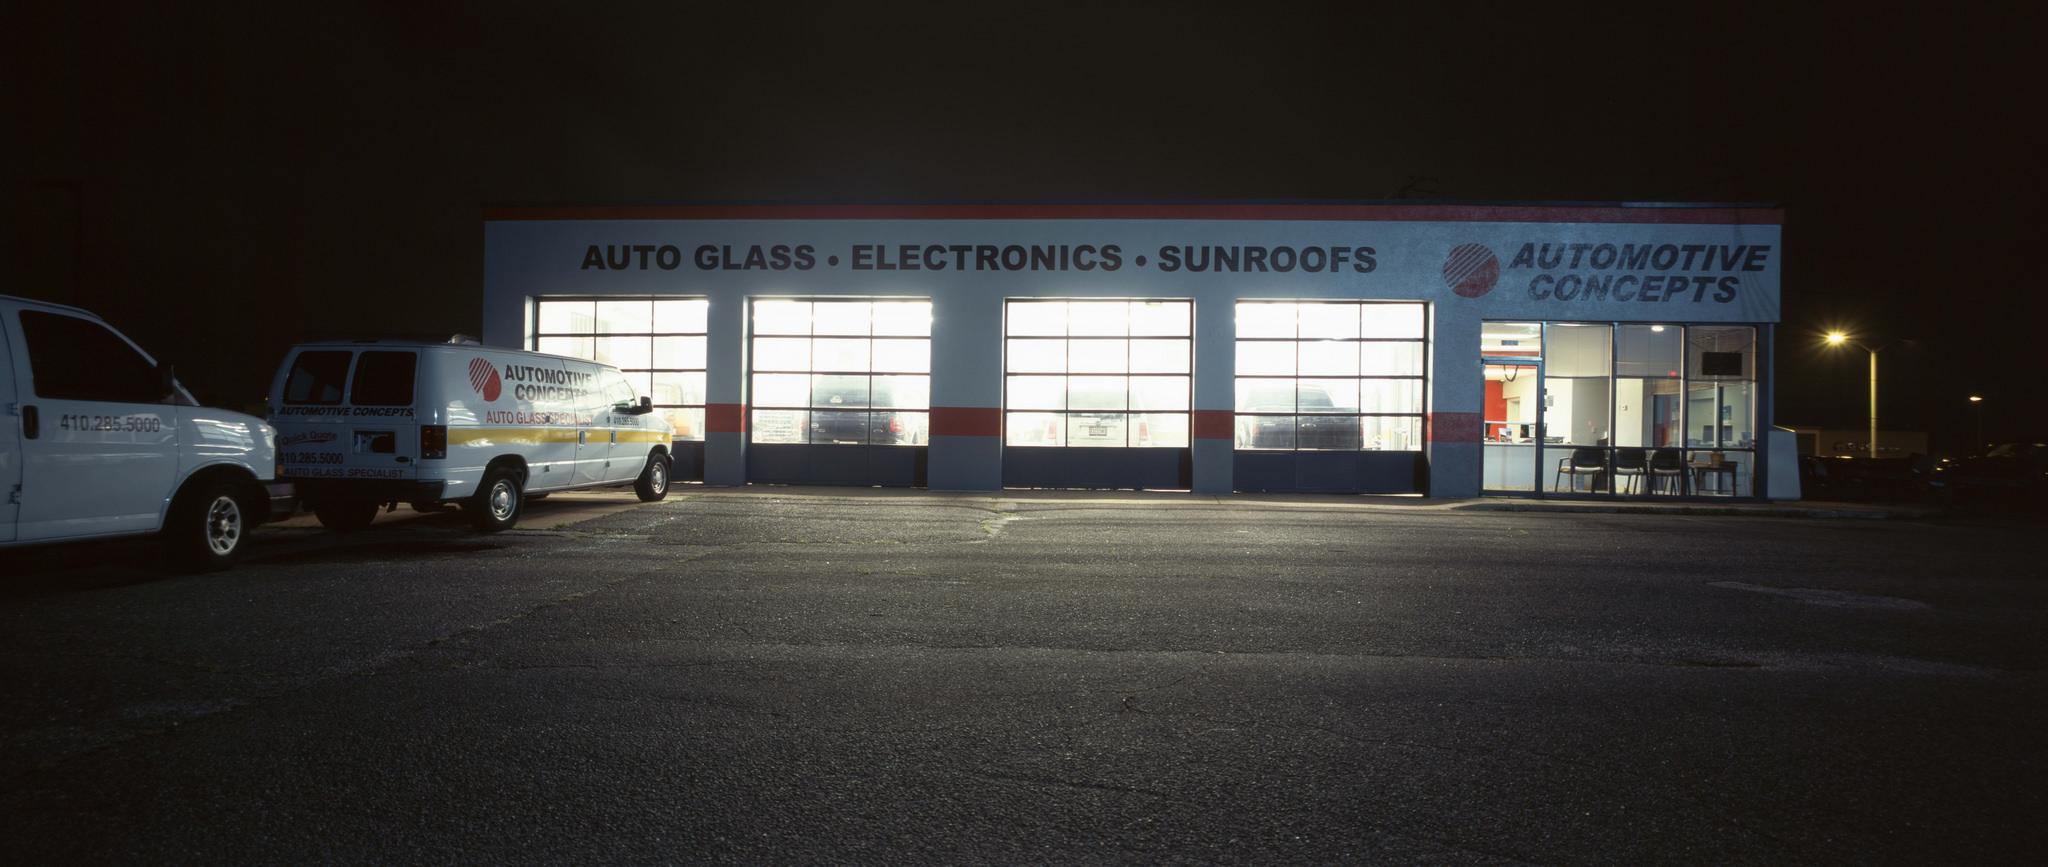 Autoglass. Electronics. Sunroofs